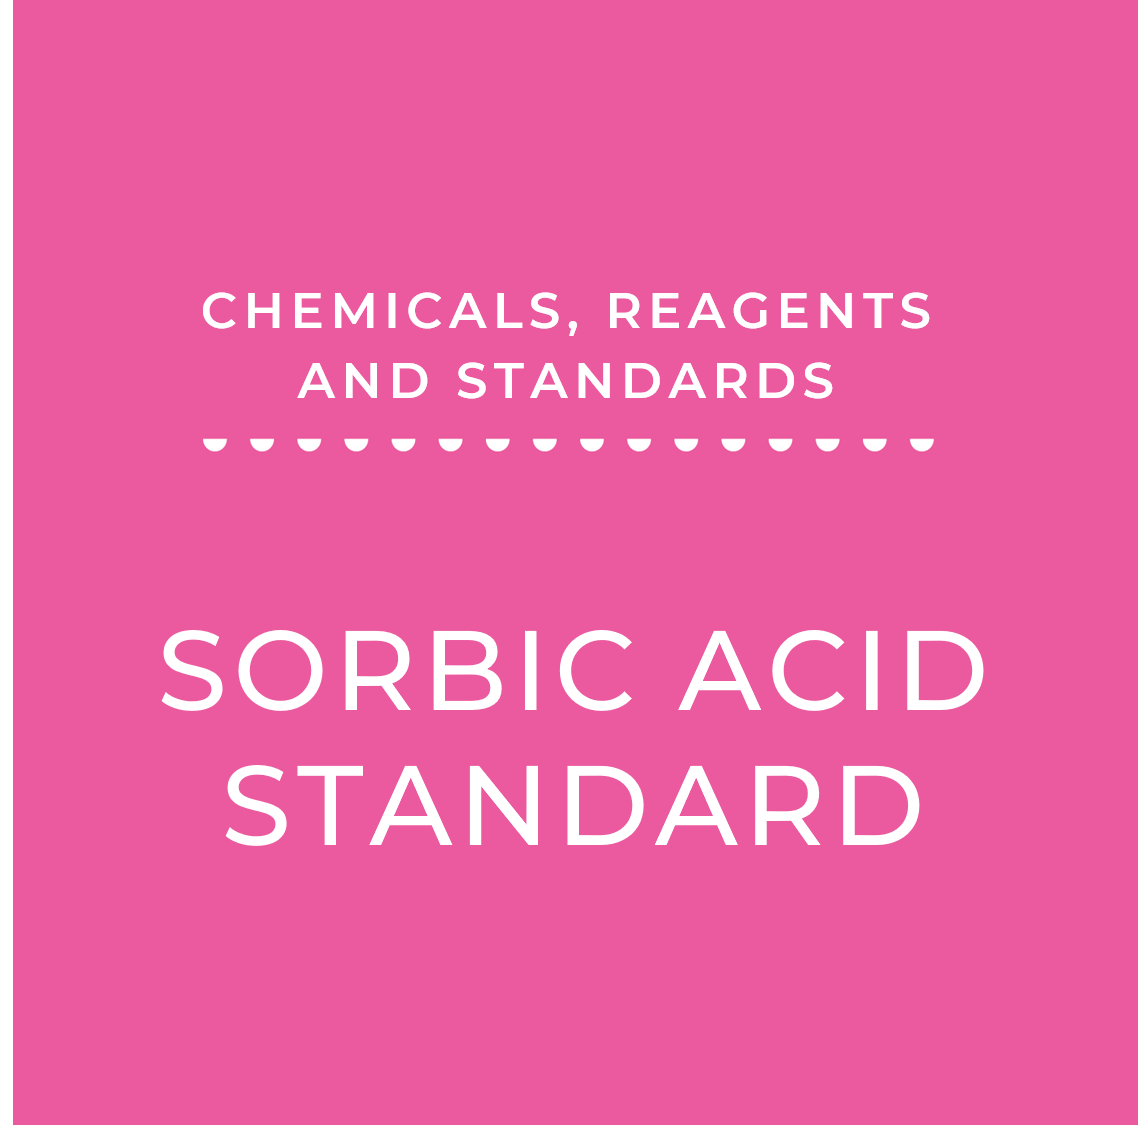 Sorbic Acid Standard